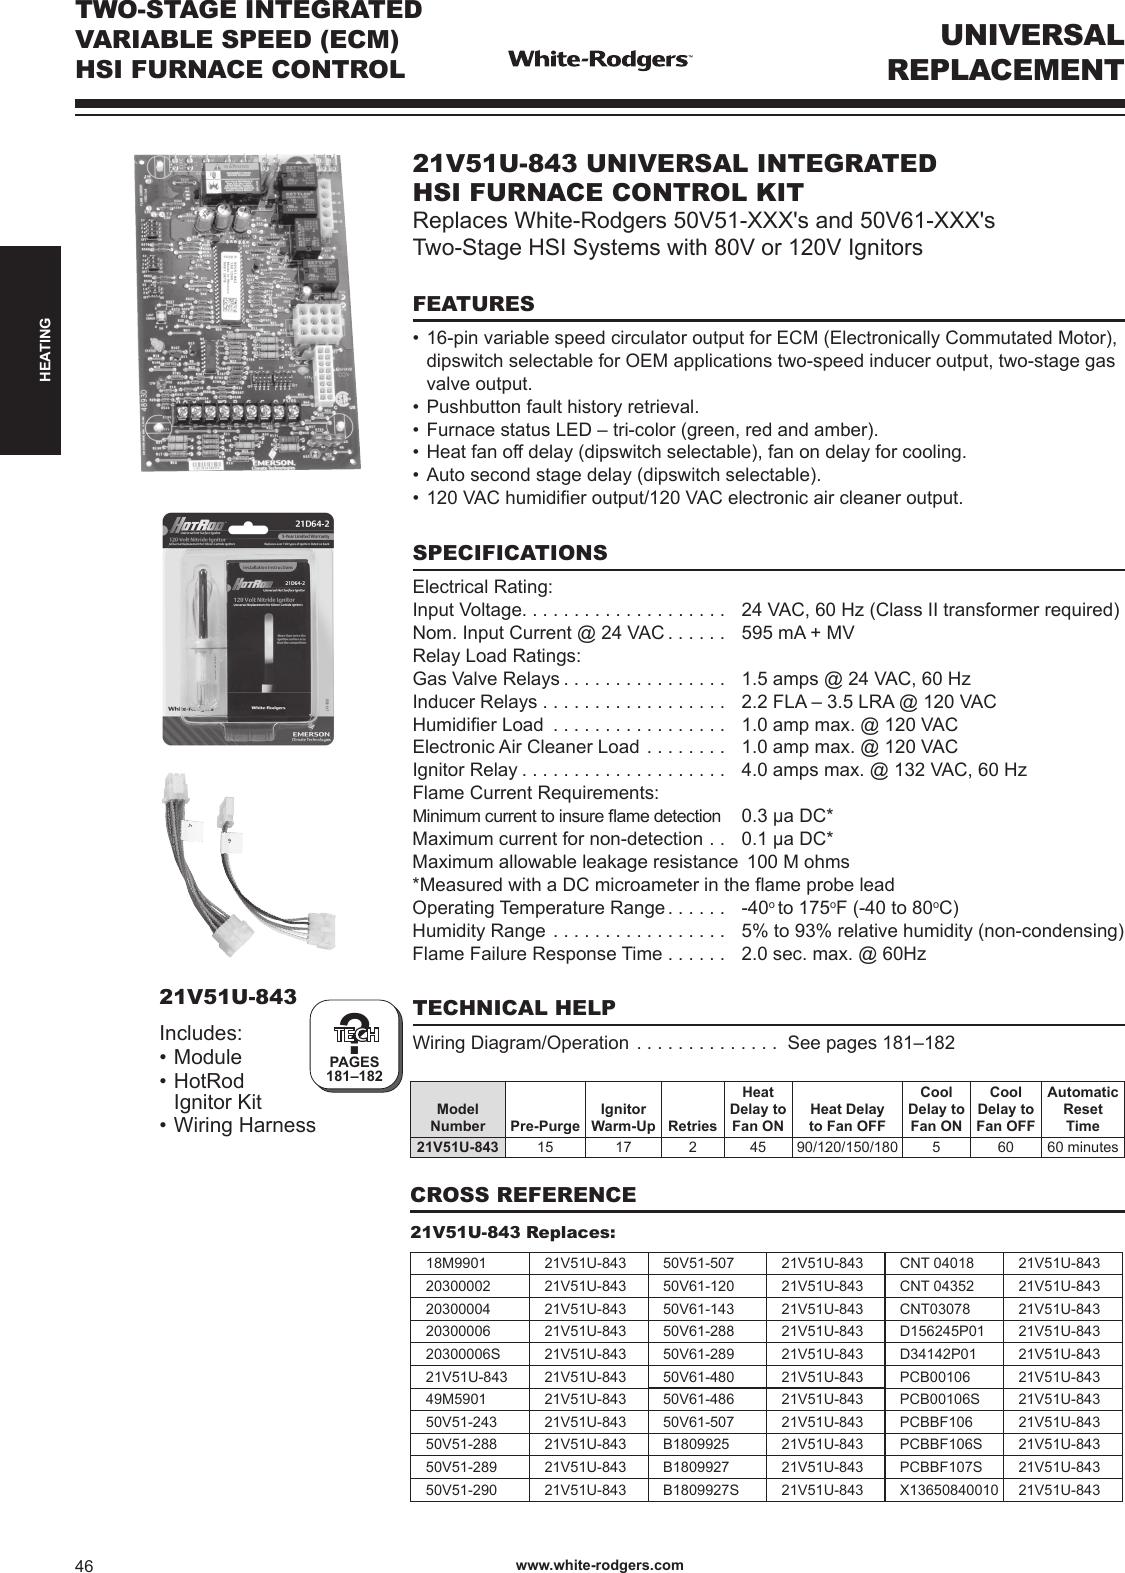 honeywell gas valve wiring diagram troy bilt pressure washer parts s8610u3009 furnace